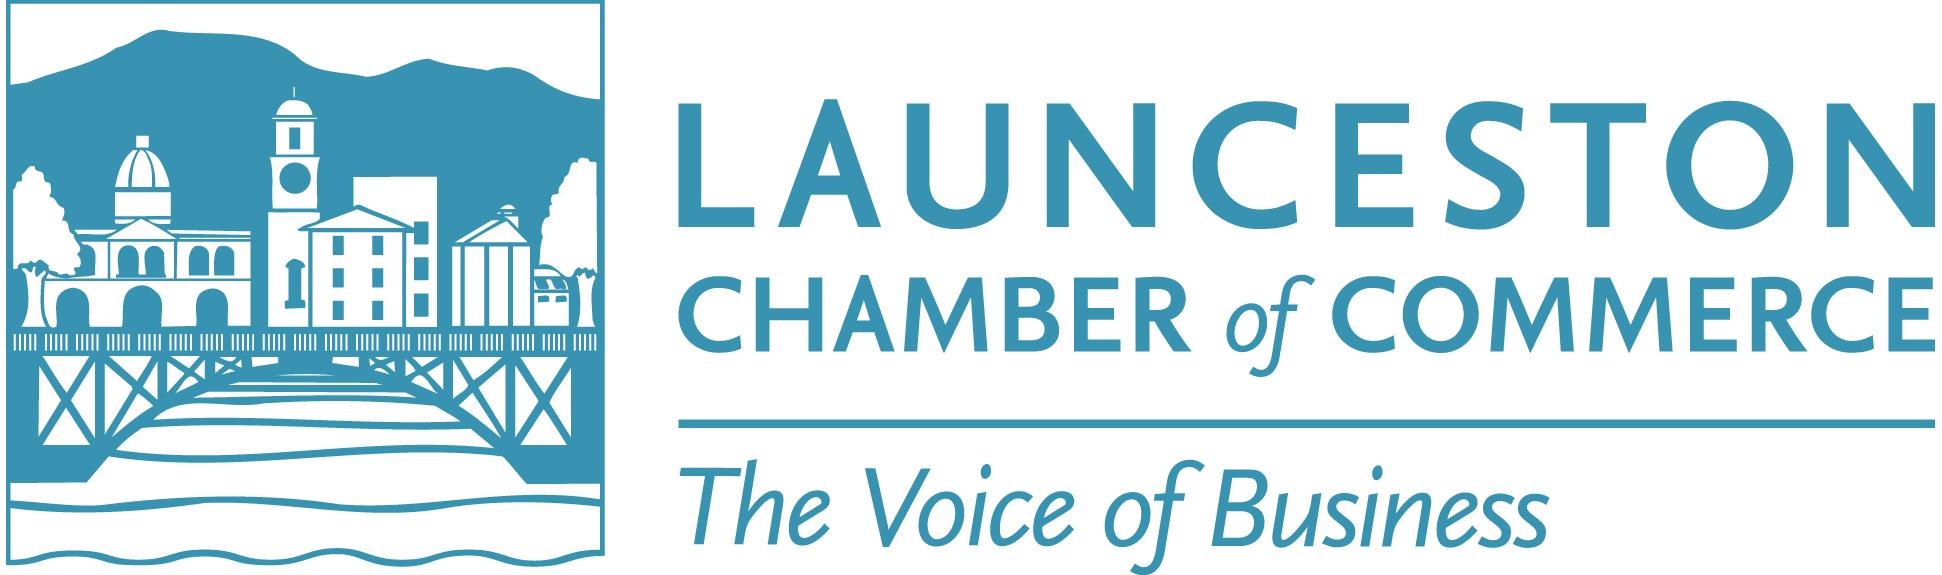 Logo of the Launceston Chamber of Commerce